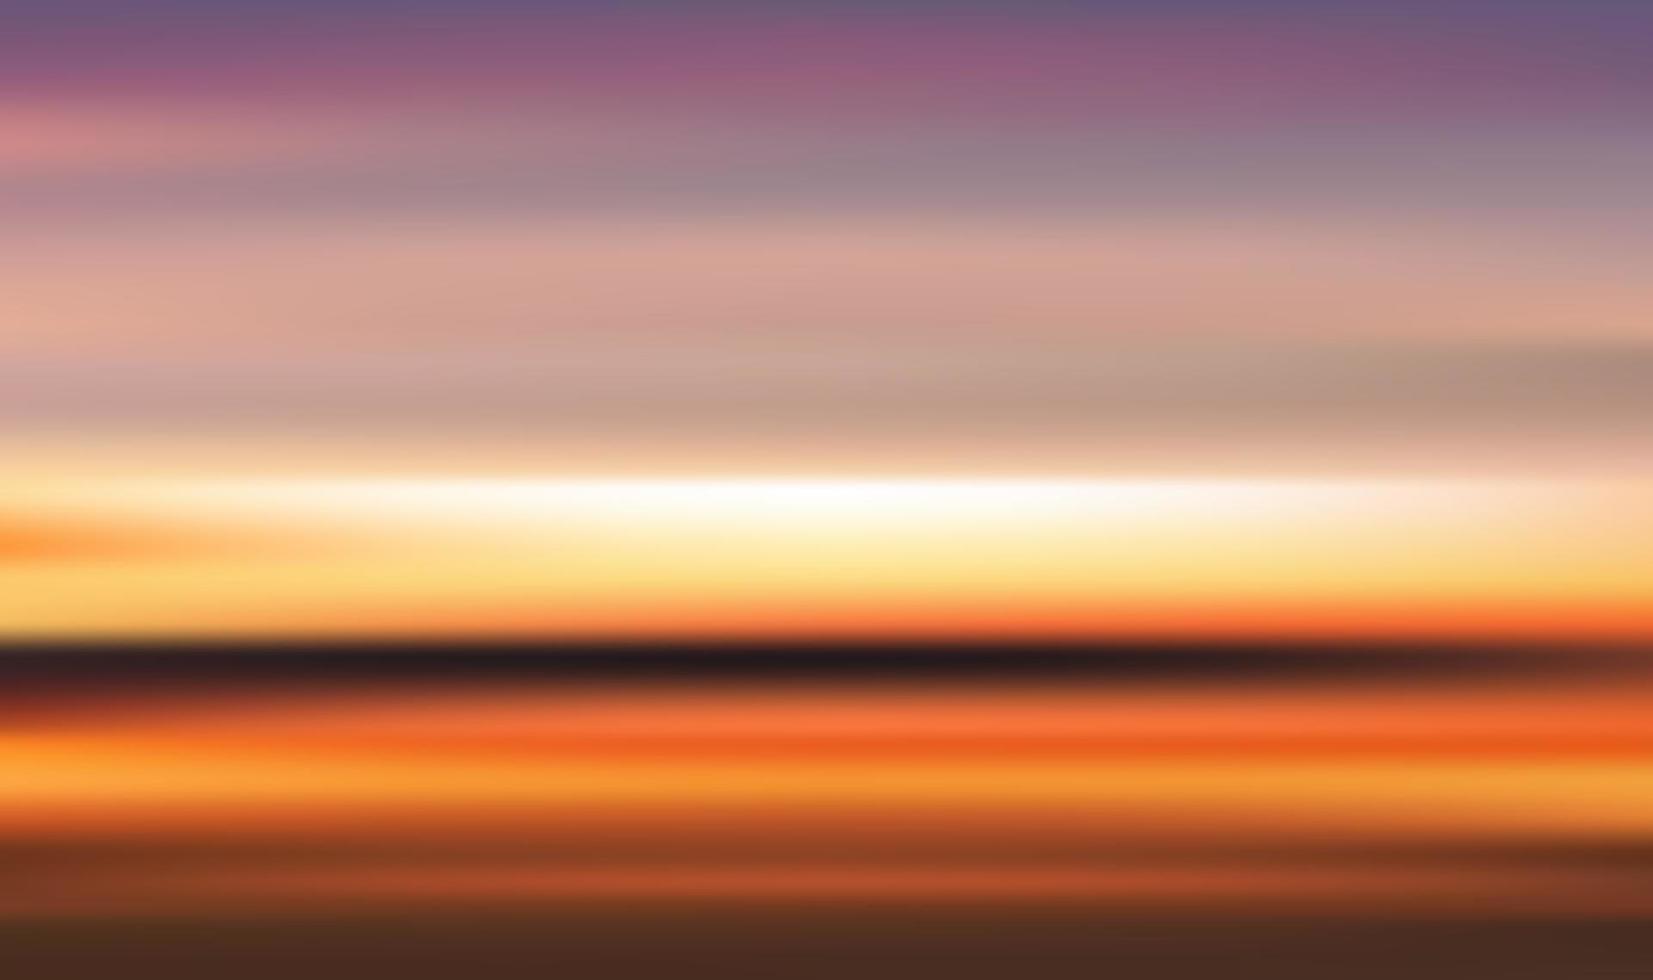 Sommer Sonnenaufgang Hintergrund vektor